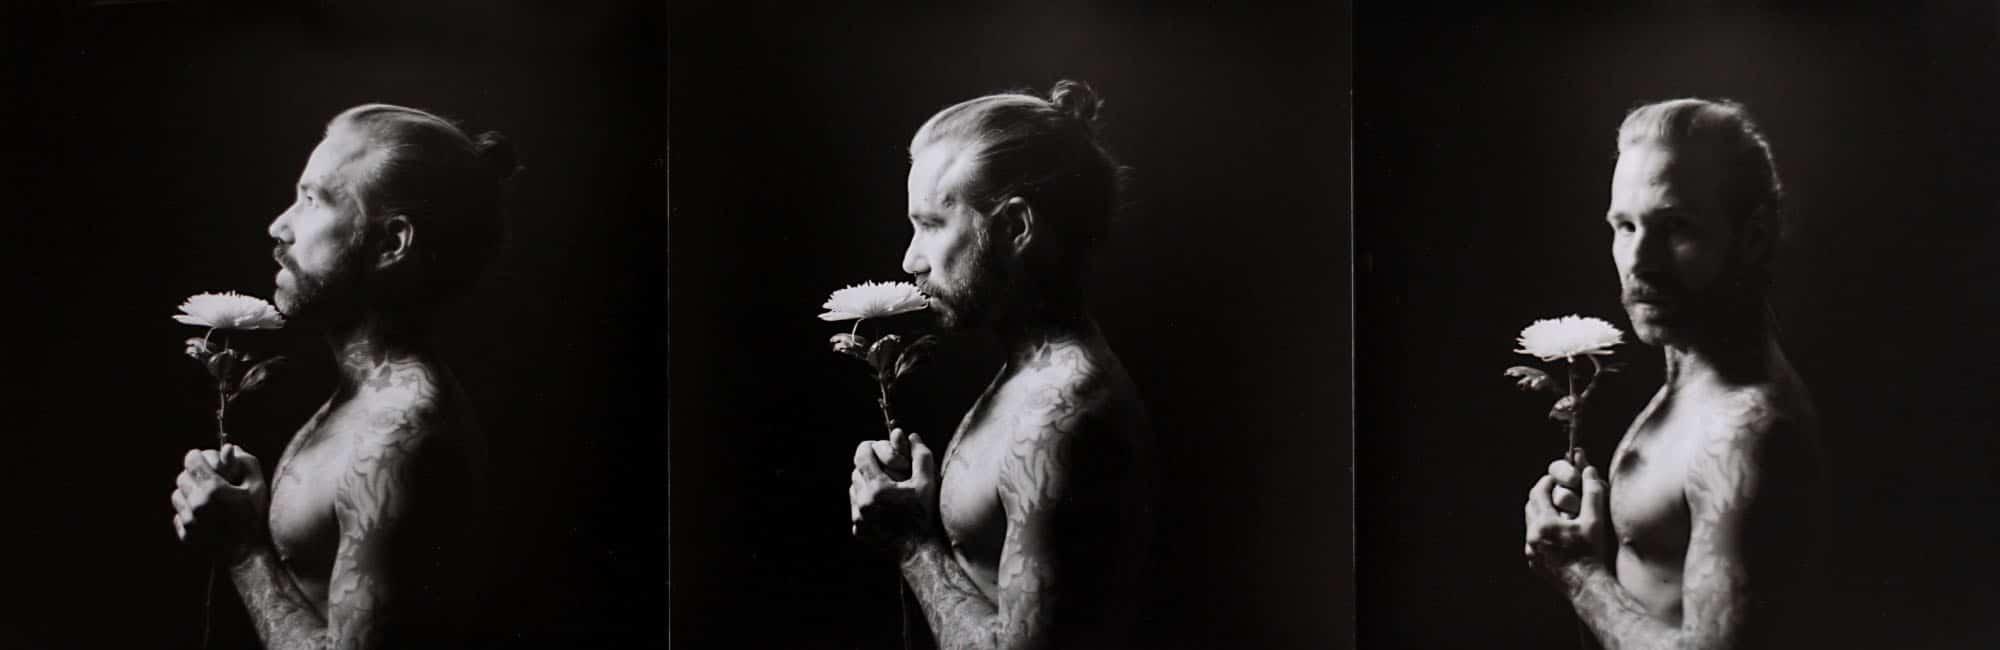 Das besondere Fotoshooting: Analoge Portraitfotos im Fotostudio bei Fotograf Christian Holthausen Photography